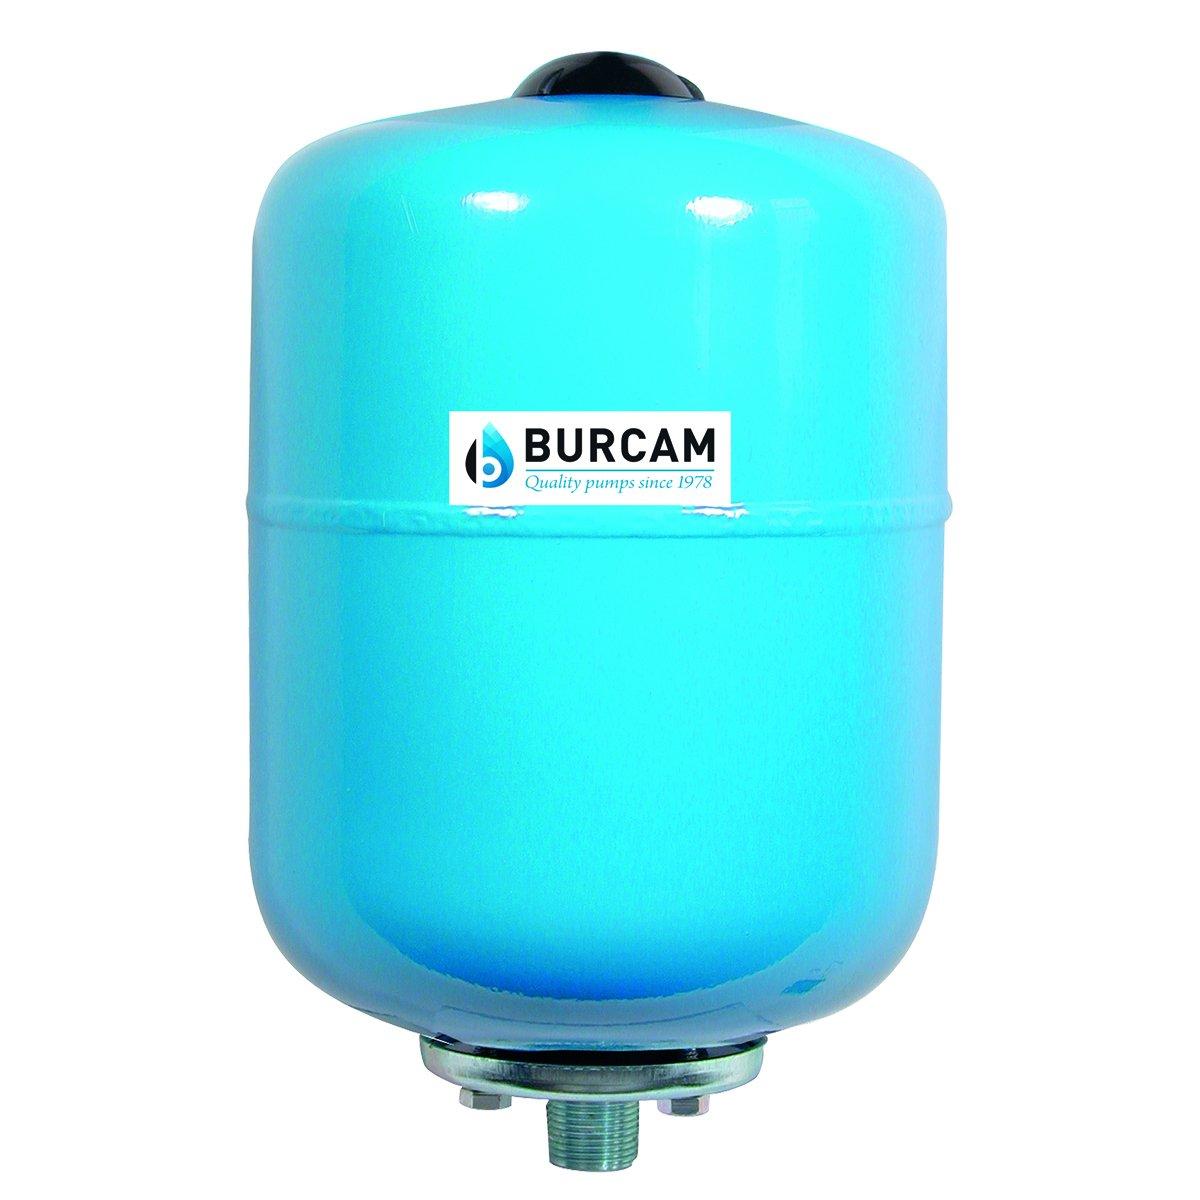 BurCam 600542B ML20 Diaphragm Pressure Tank, 5.3 gal,